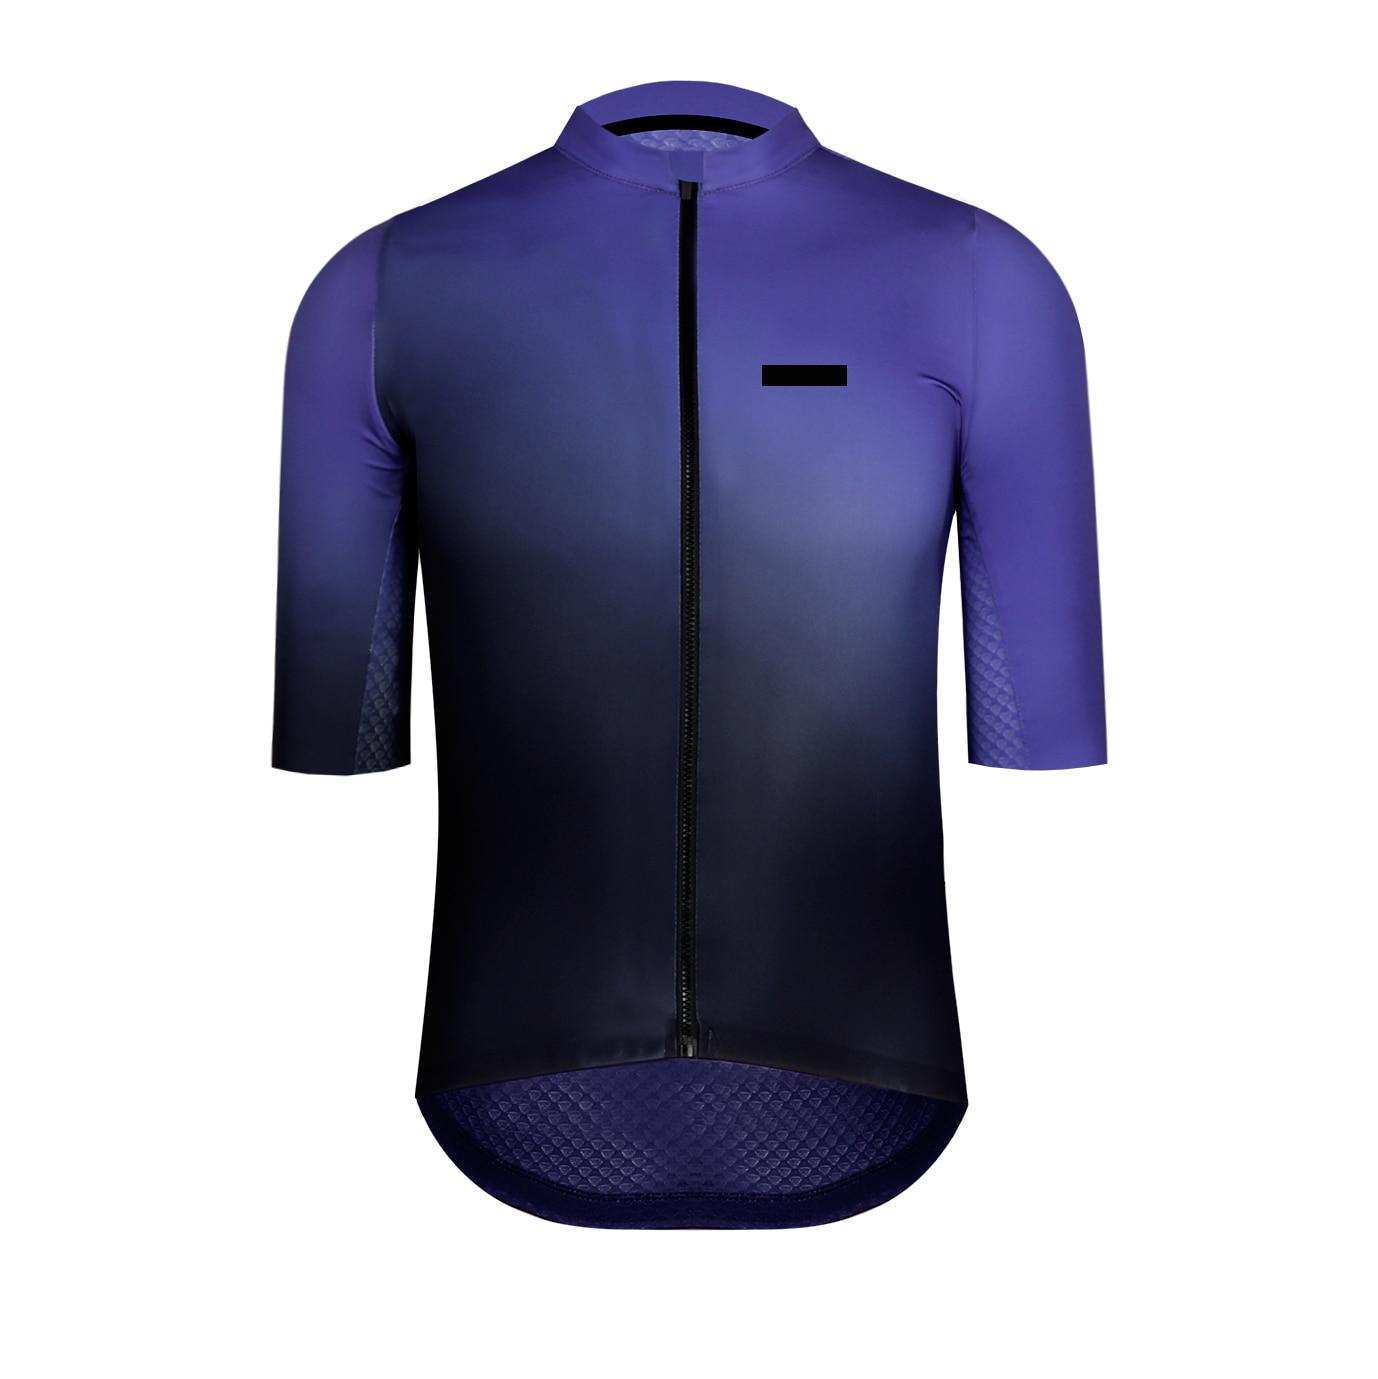 2020 New COLOURBURN PRO TEAM AERO Short Sleeve Cycling Jerseys Summer Ropa Ciclismo ROAD MTB Speed Bicycle Shirt